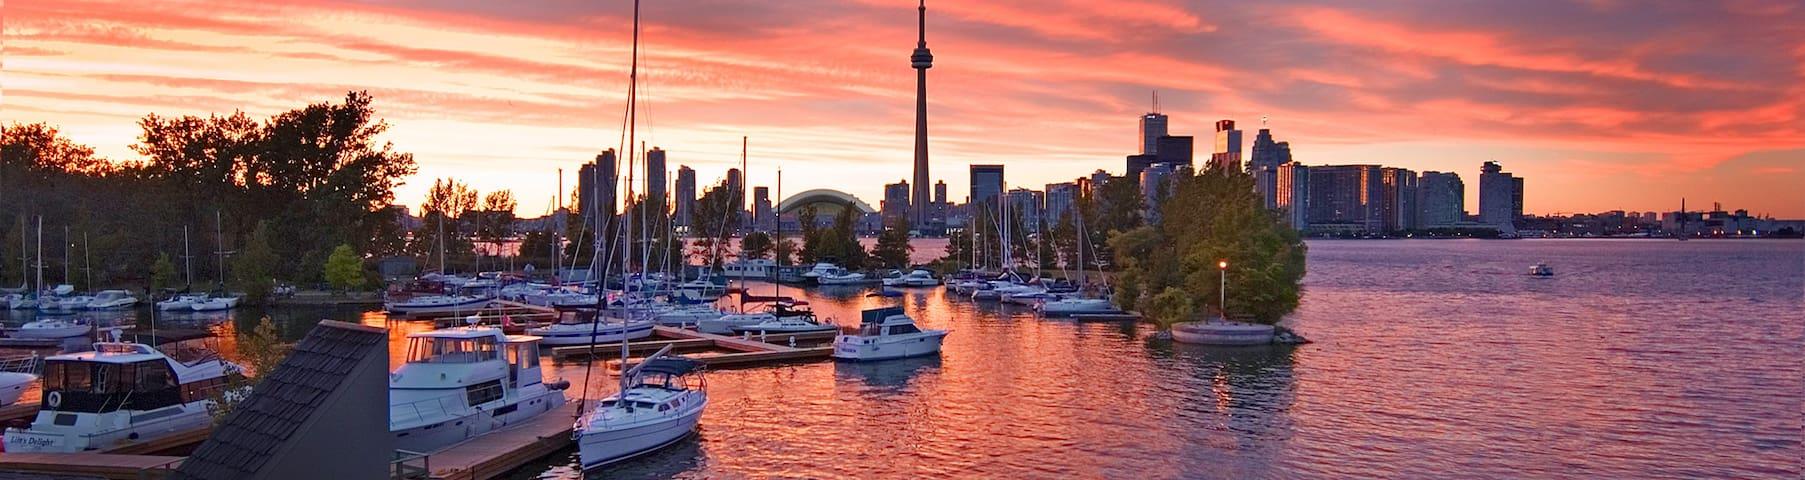 Stay on a Sailboat on Toronto Island